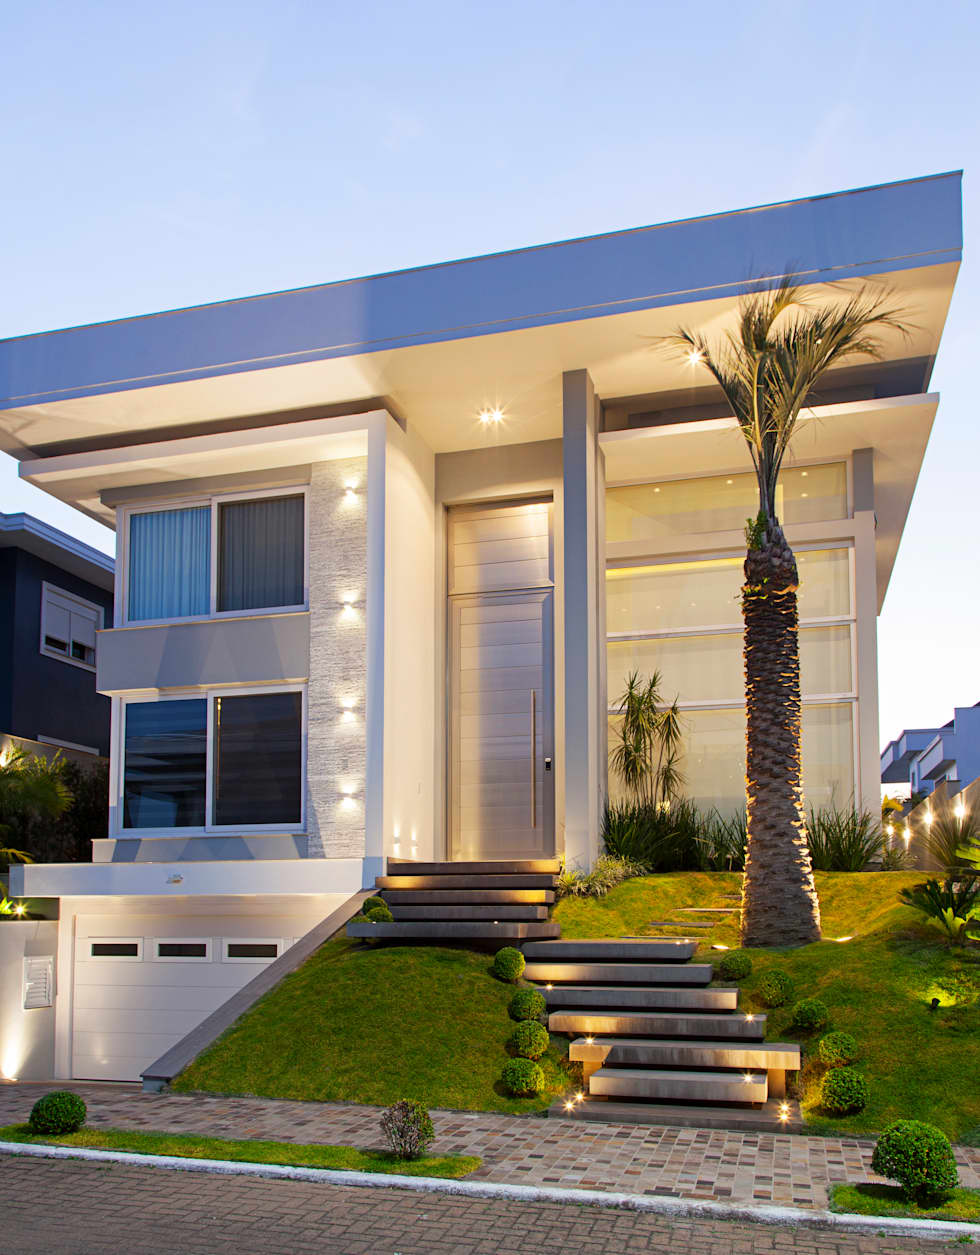 Fotos de decora o design de interiores e reformas homify - Entrada de casas modernas ...